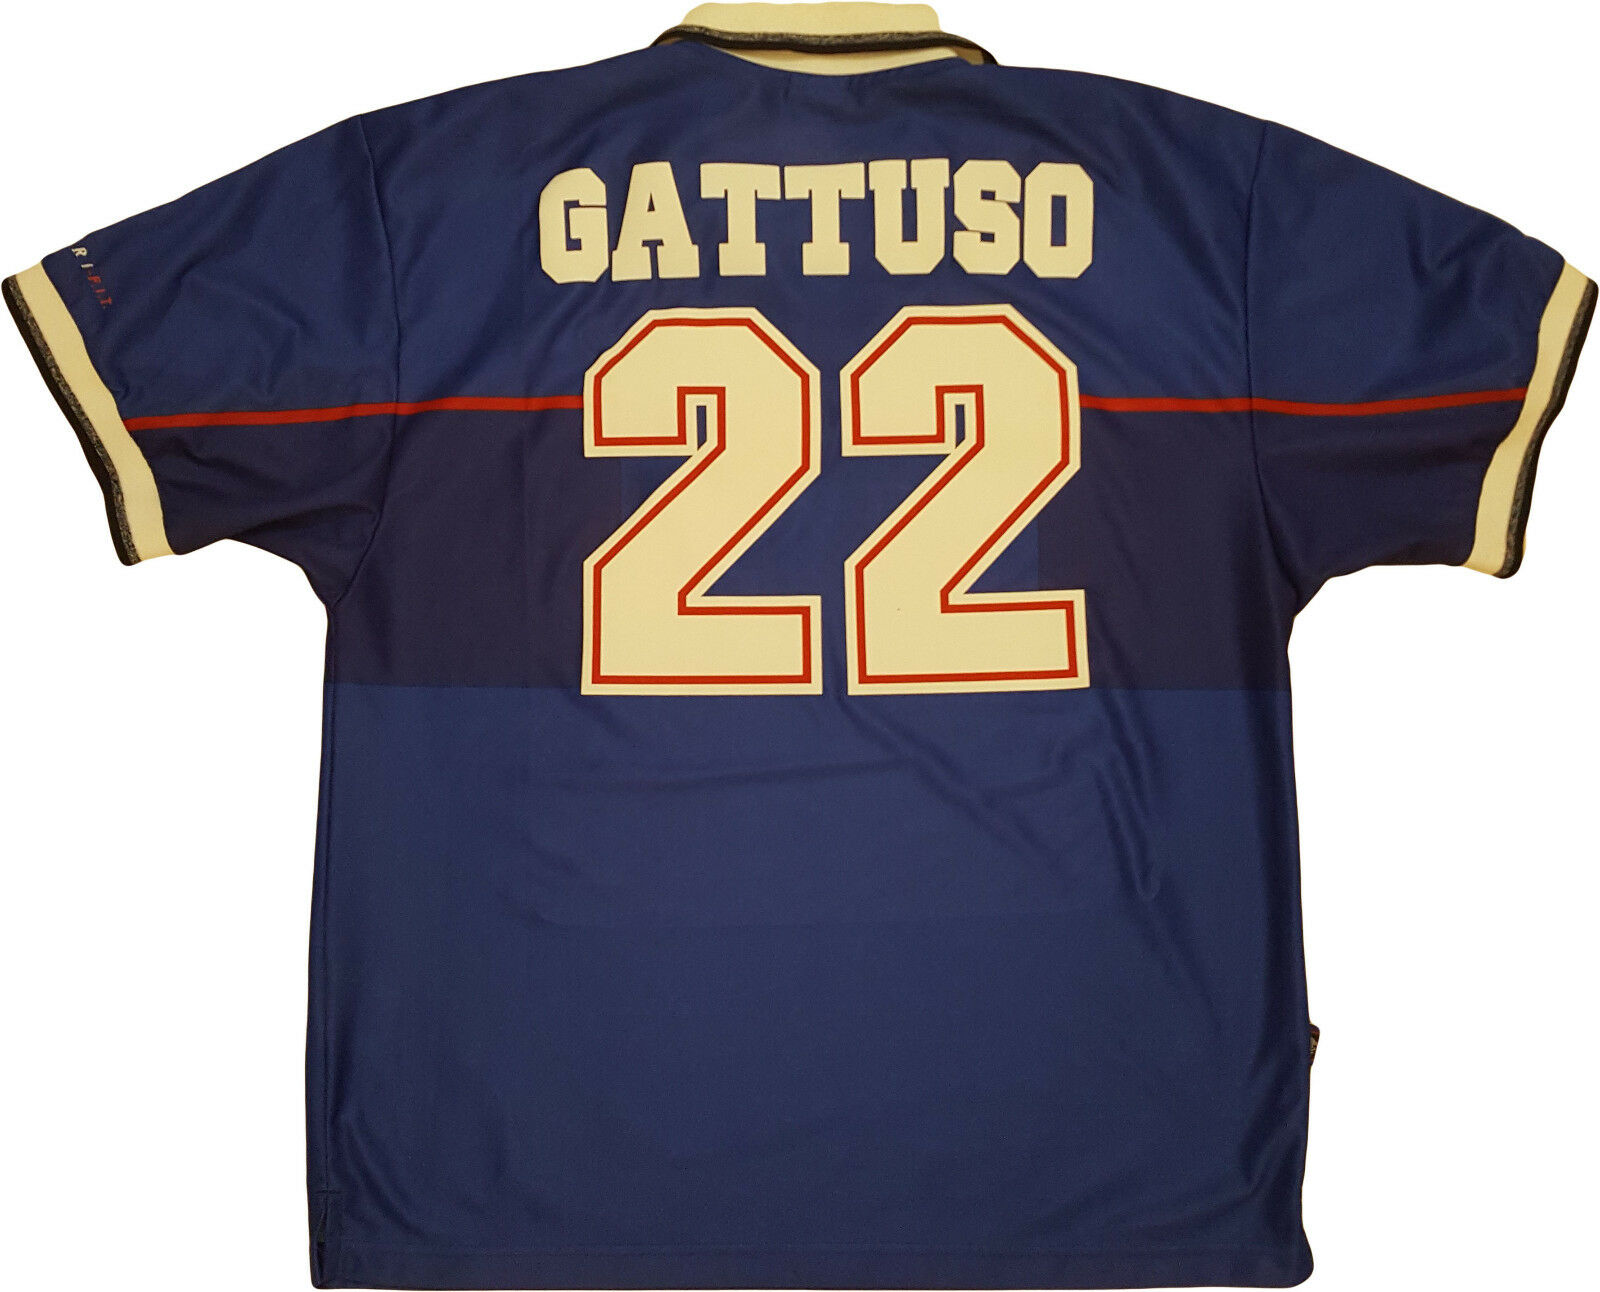 Maglia Gattuso vintage Rangers Glasgow Shirt Maillot Trikot 1997-98 Jersey